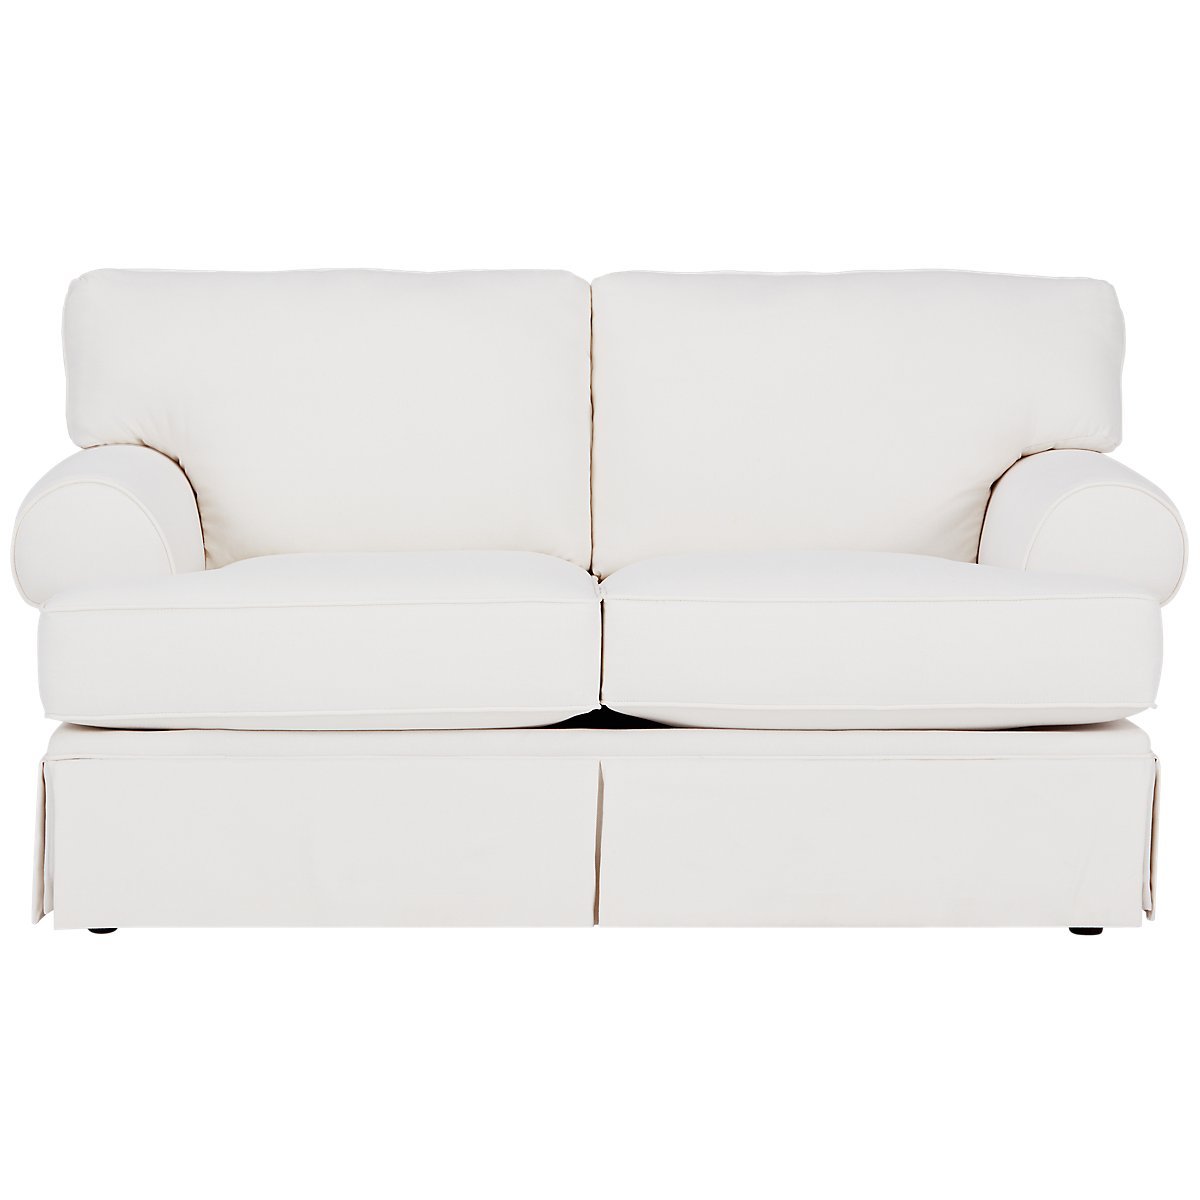 City Furniture Turner White Fabric Loveseat